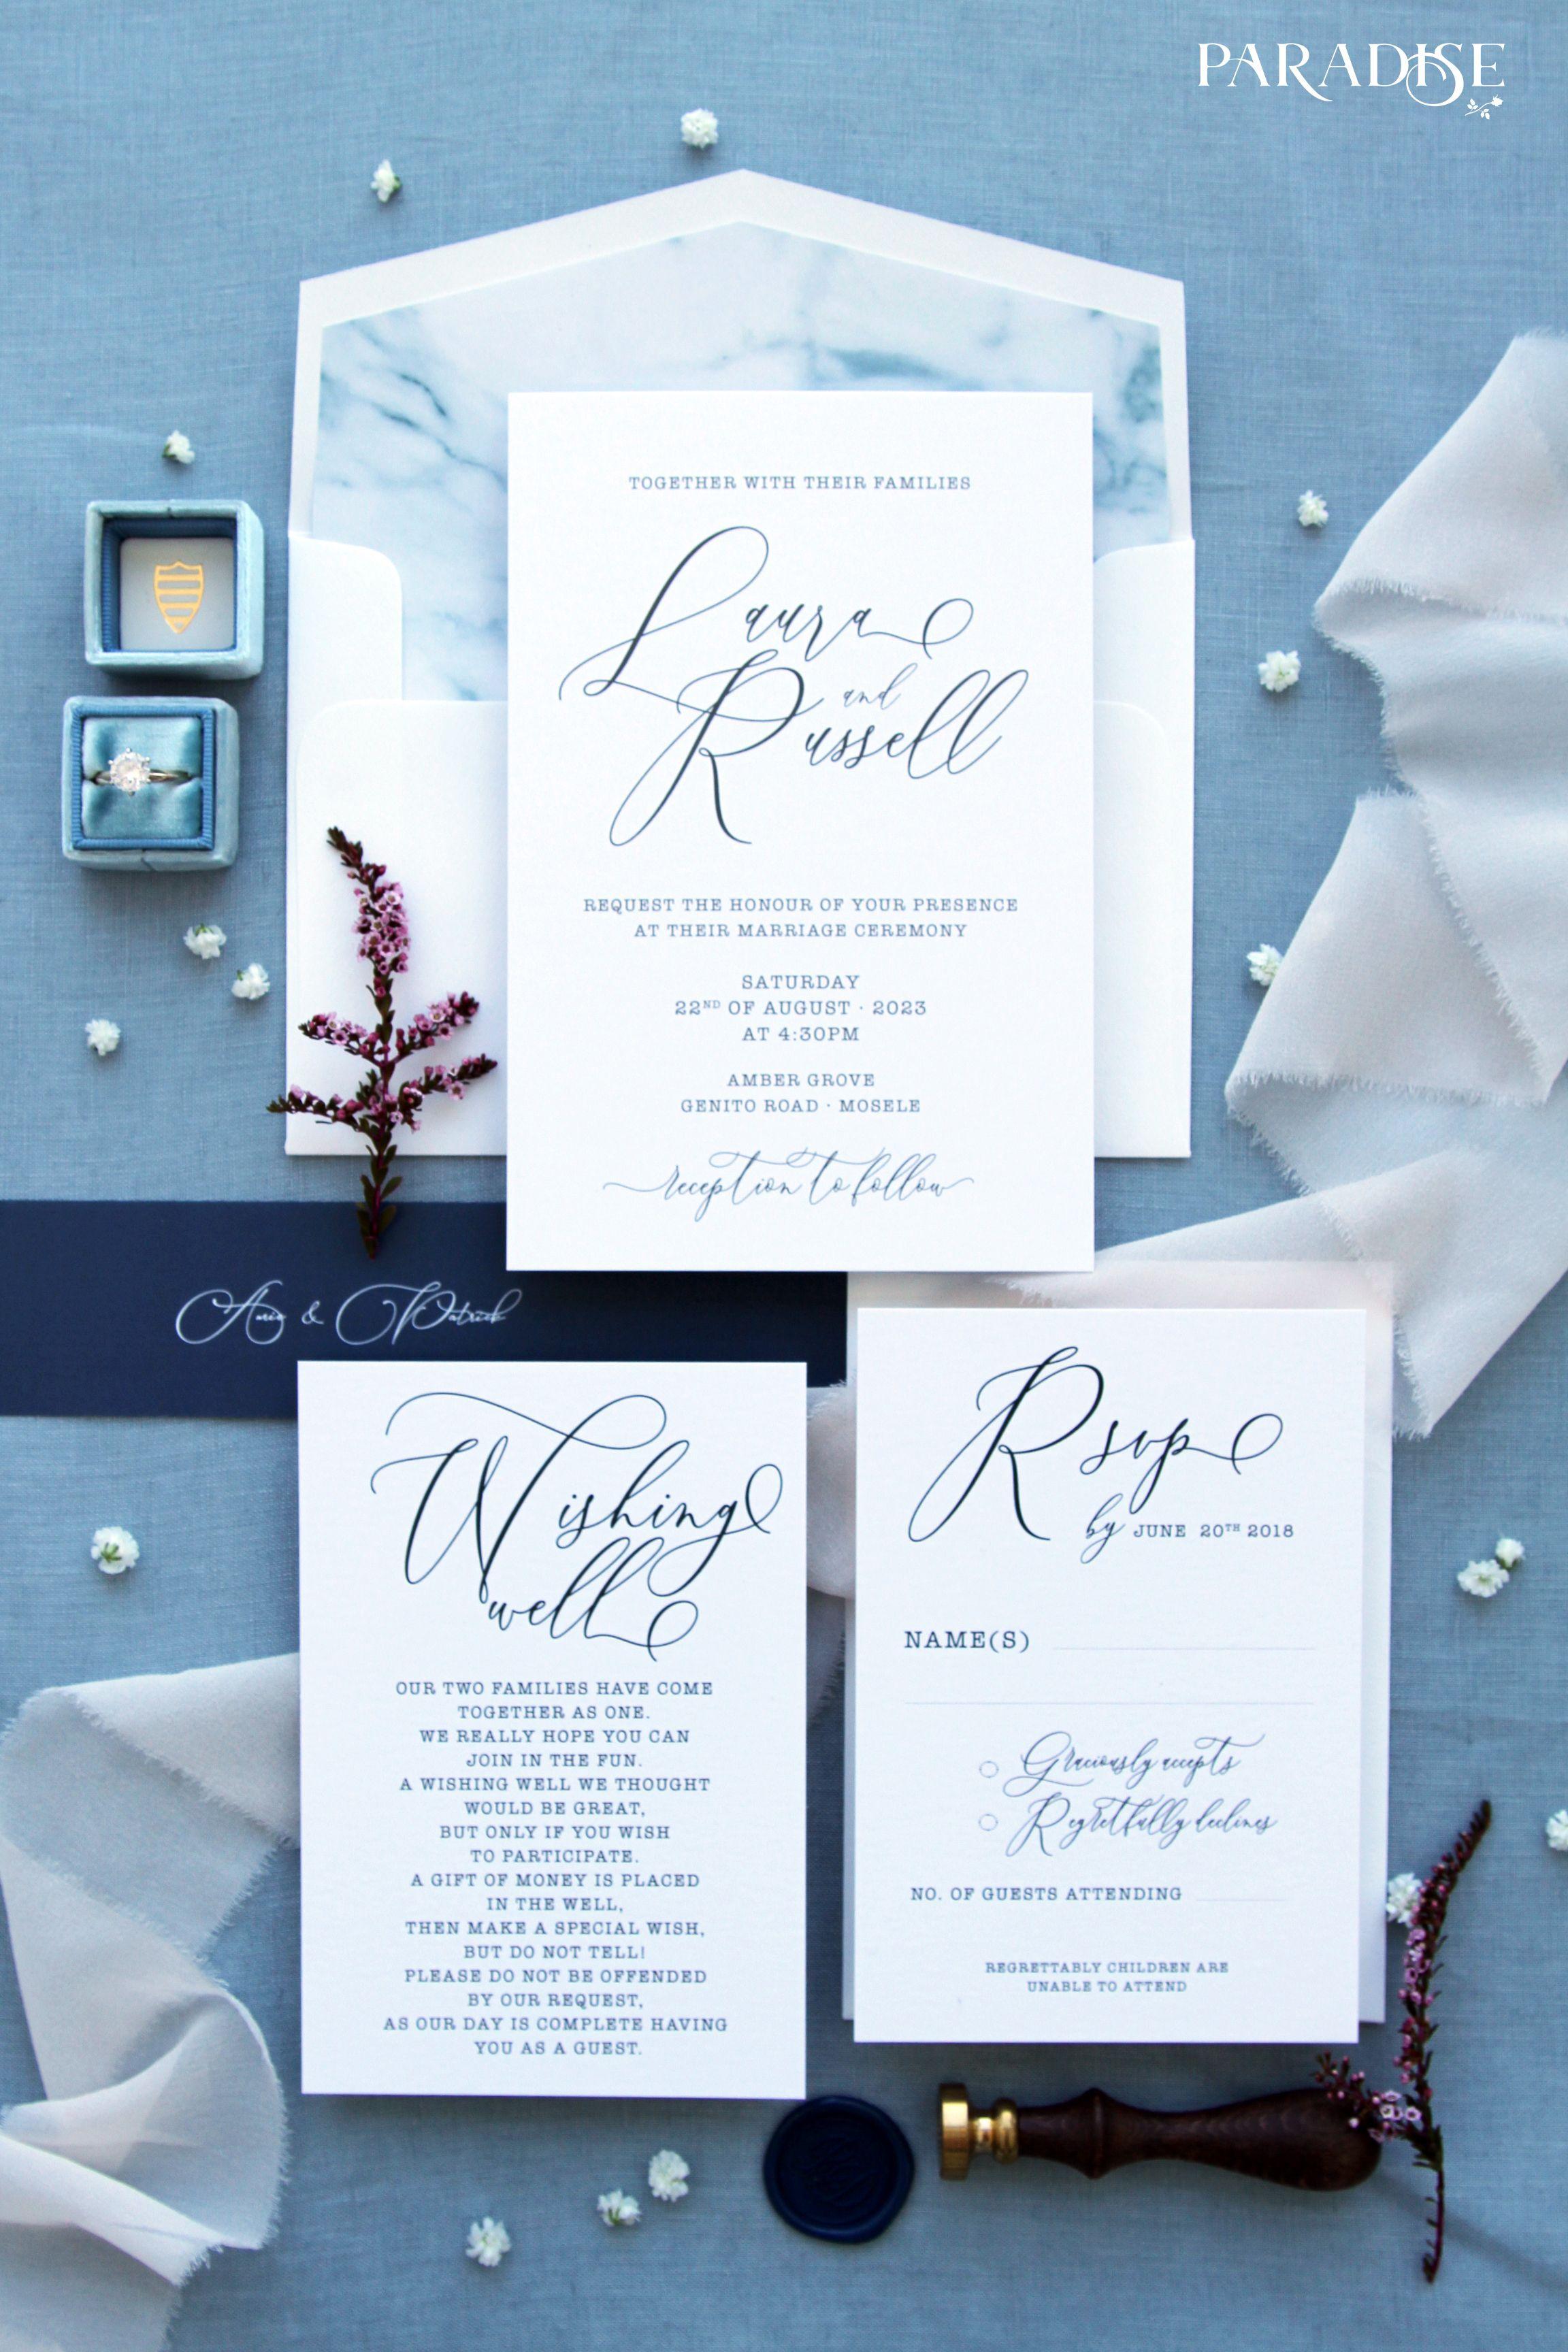 Outstanding Wedding Gift Not Attending Vignette - The Wedding Ideas ...